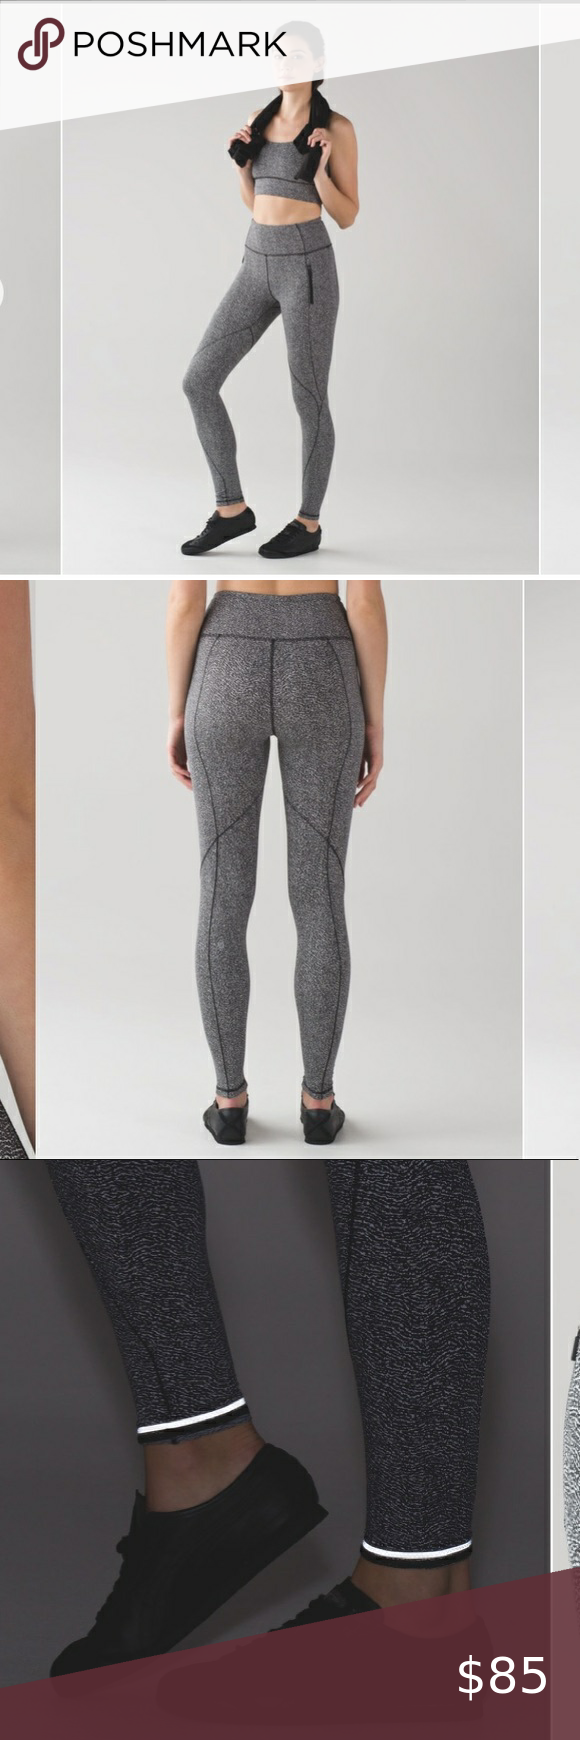 Lululemon Run It Out Luxtreme Leggings Jacquard In 2020 Leggings Are Not Pants Lululemon Pants For Women